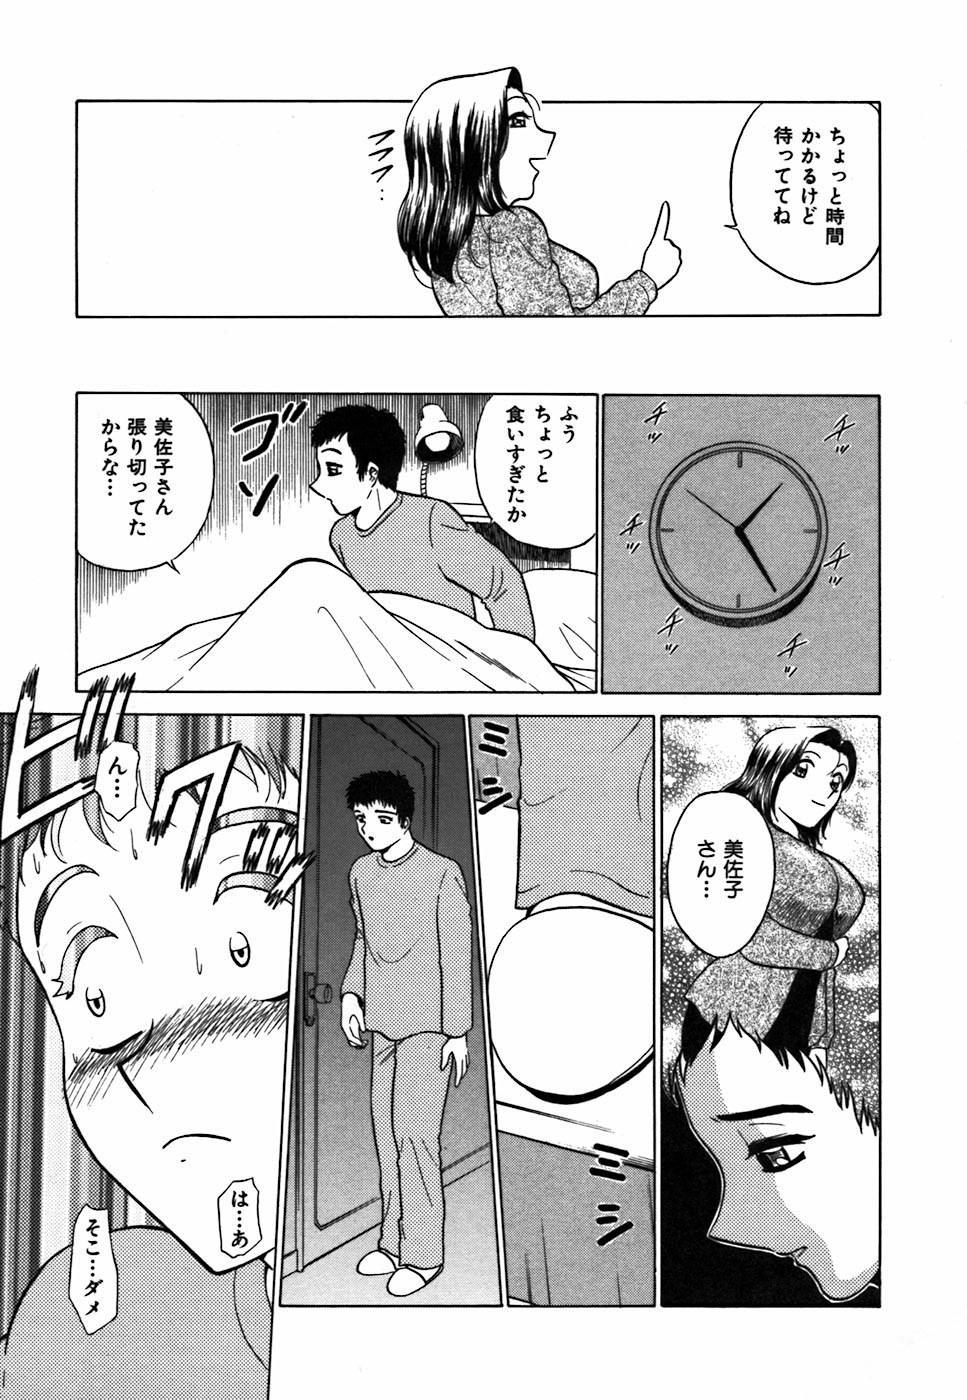 Kimi ga Nozomu Katachi | Appearance for which you hope 88